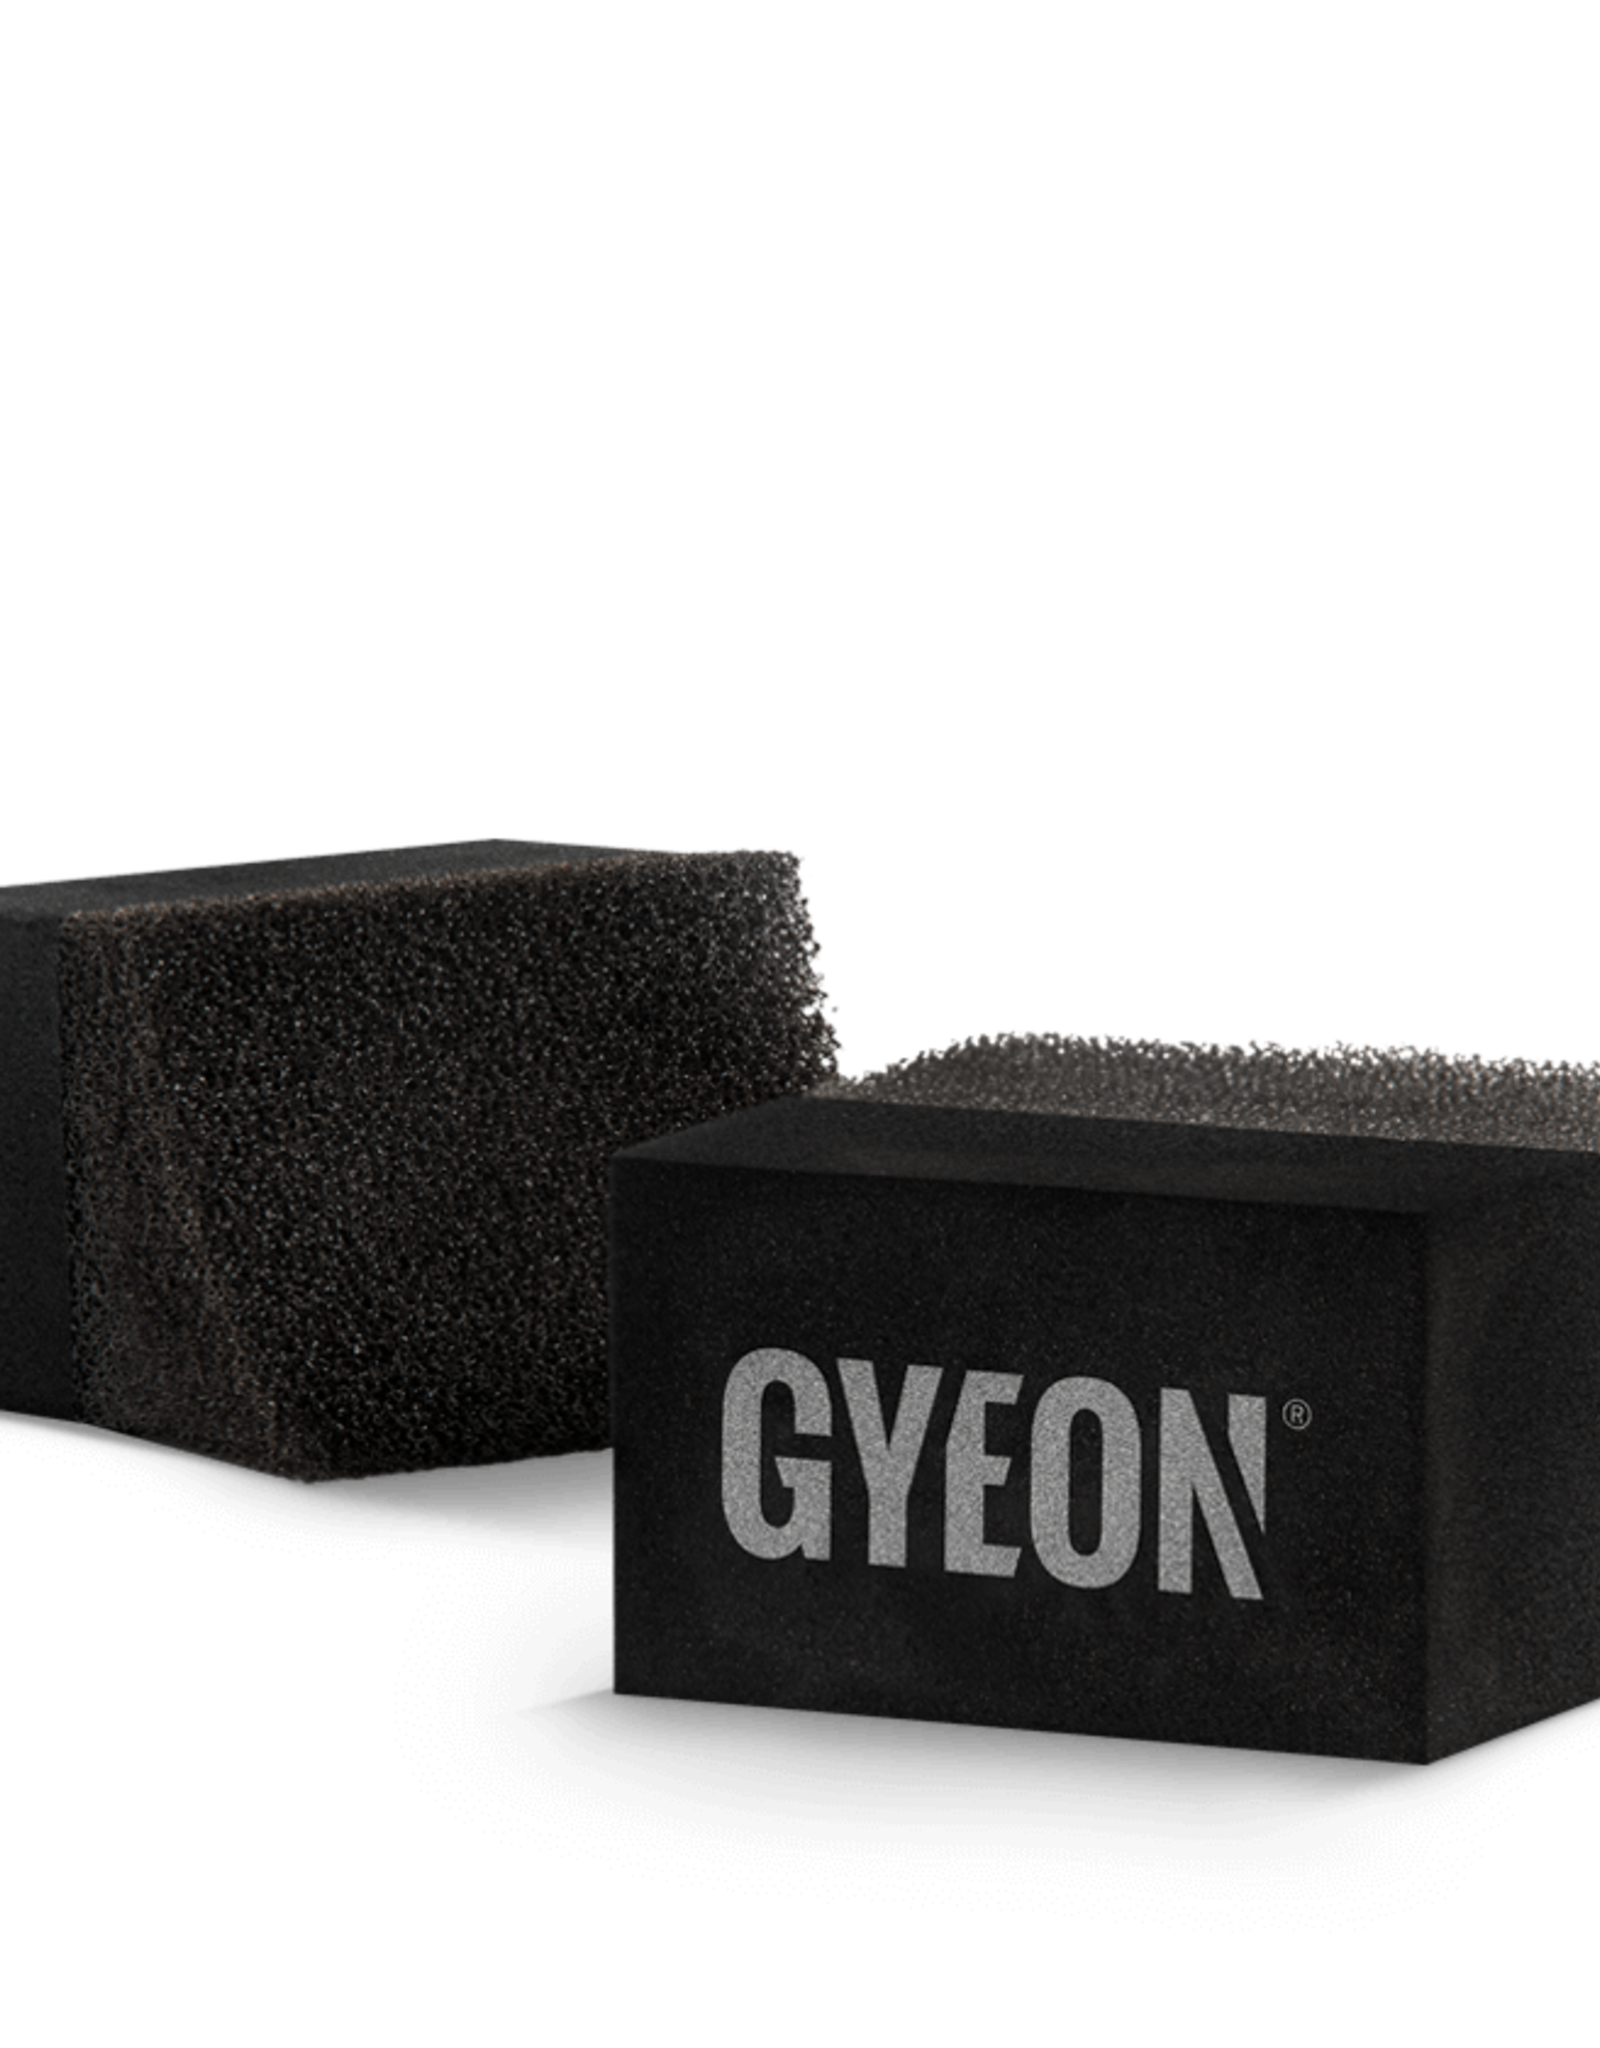 Gyeon Gyeon Q2M Tire Applicator large 2-Pack